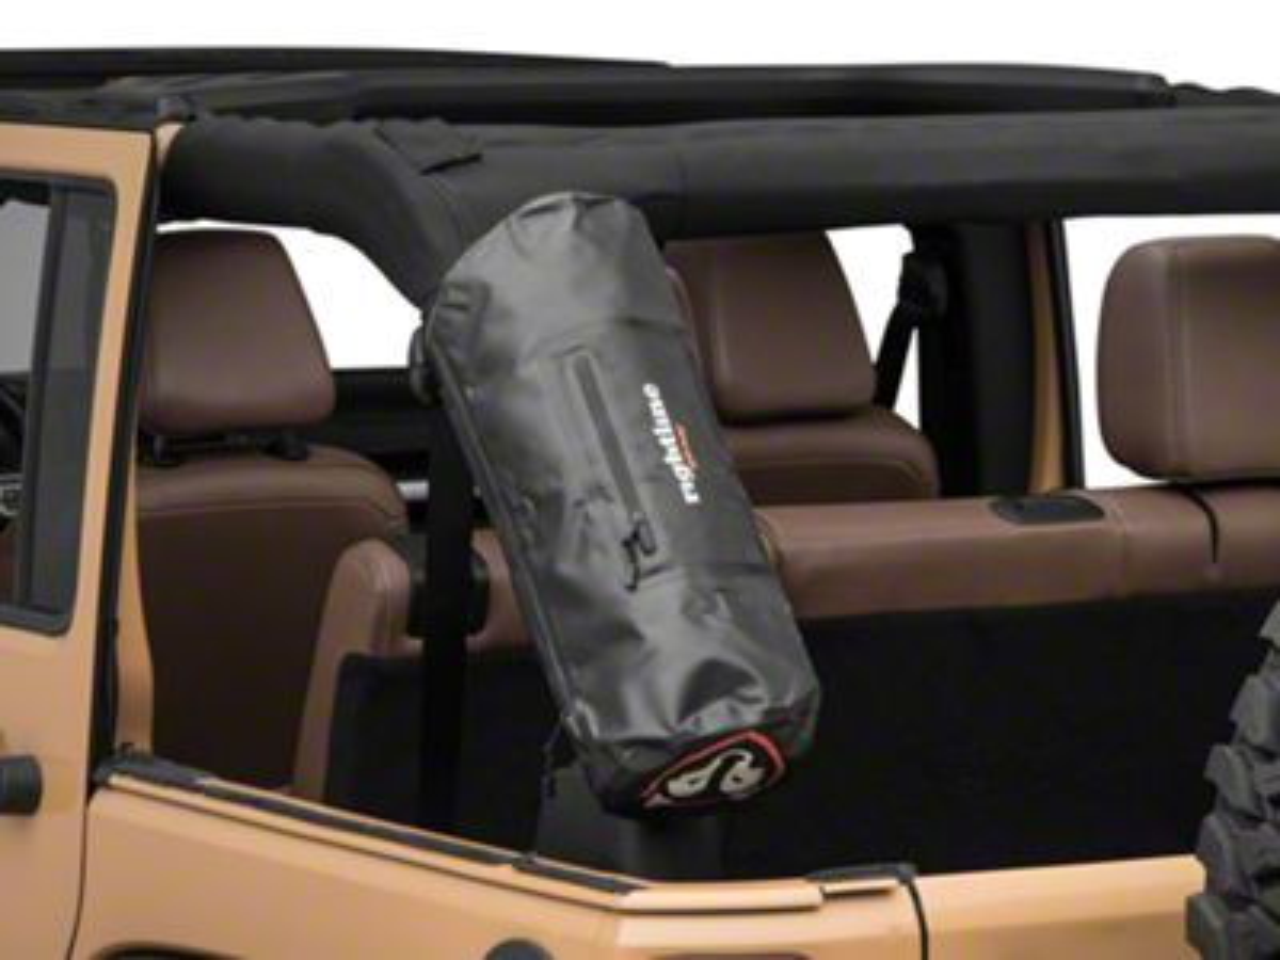 Rightline Gear Roll Bar Storage Bag - Black (87-19 Jeep Wrangler YJ, TJ, JK & JL)